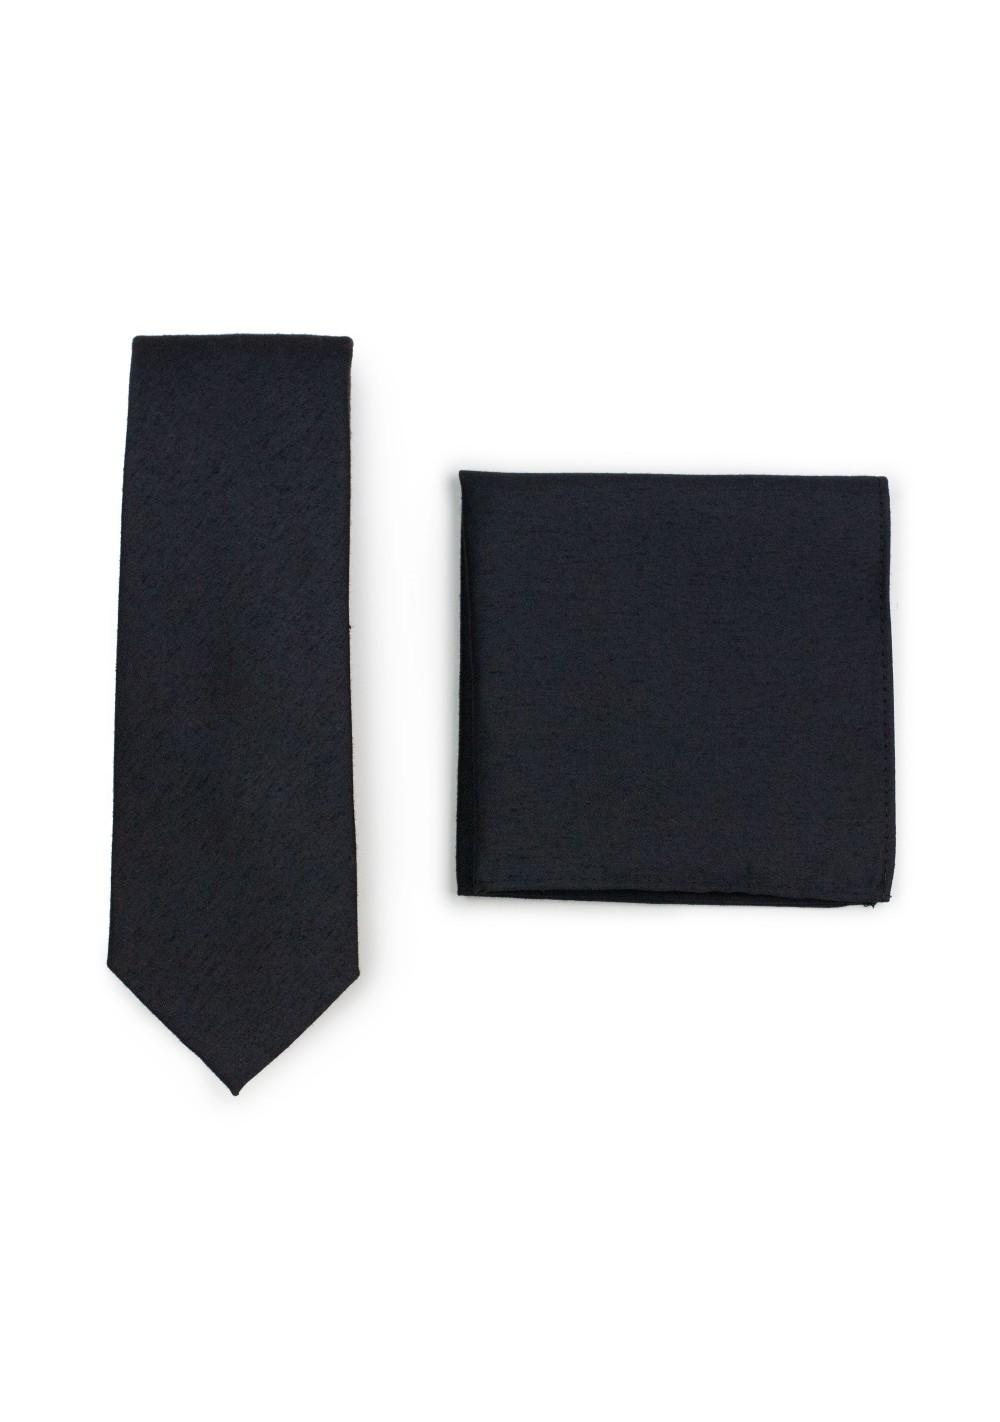 Matte Black Skinny Tie Set